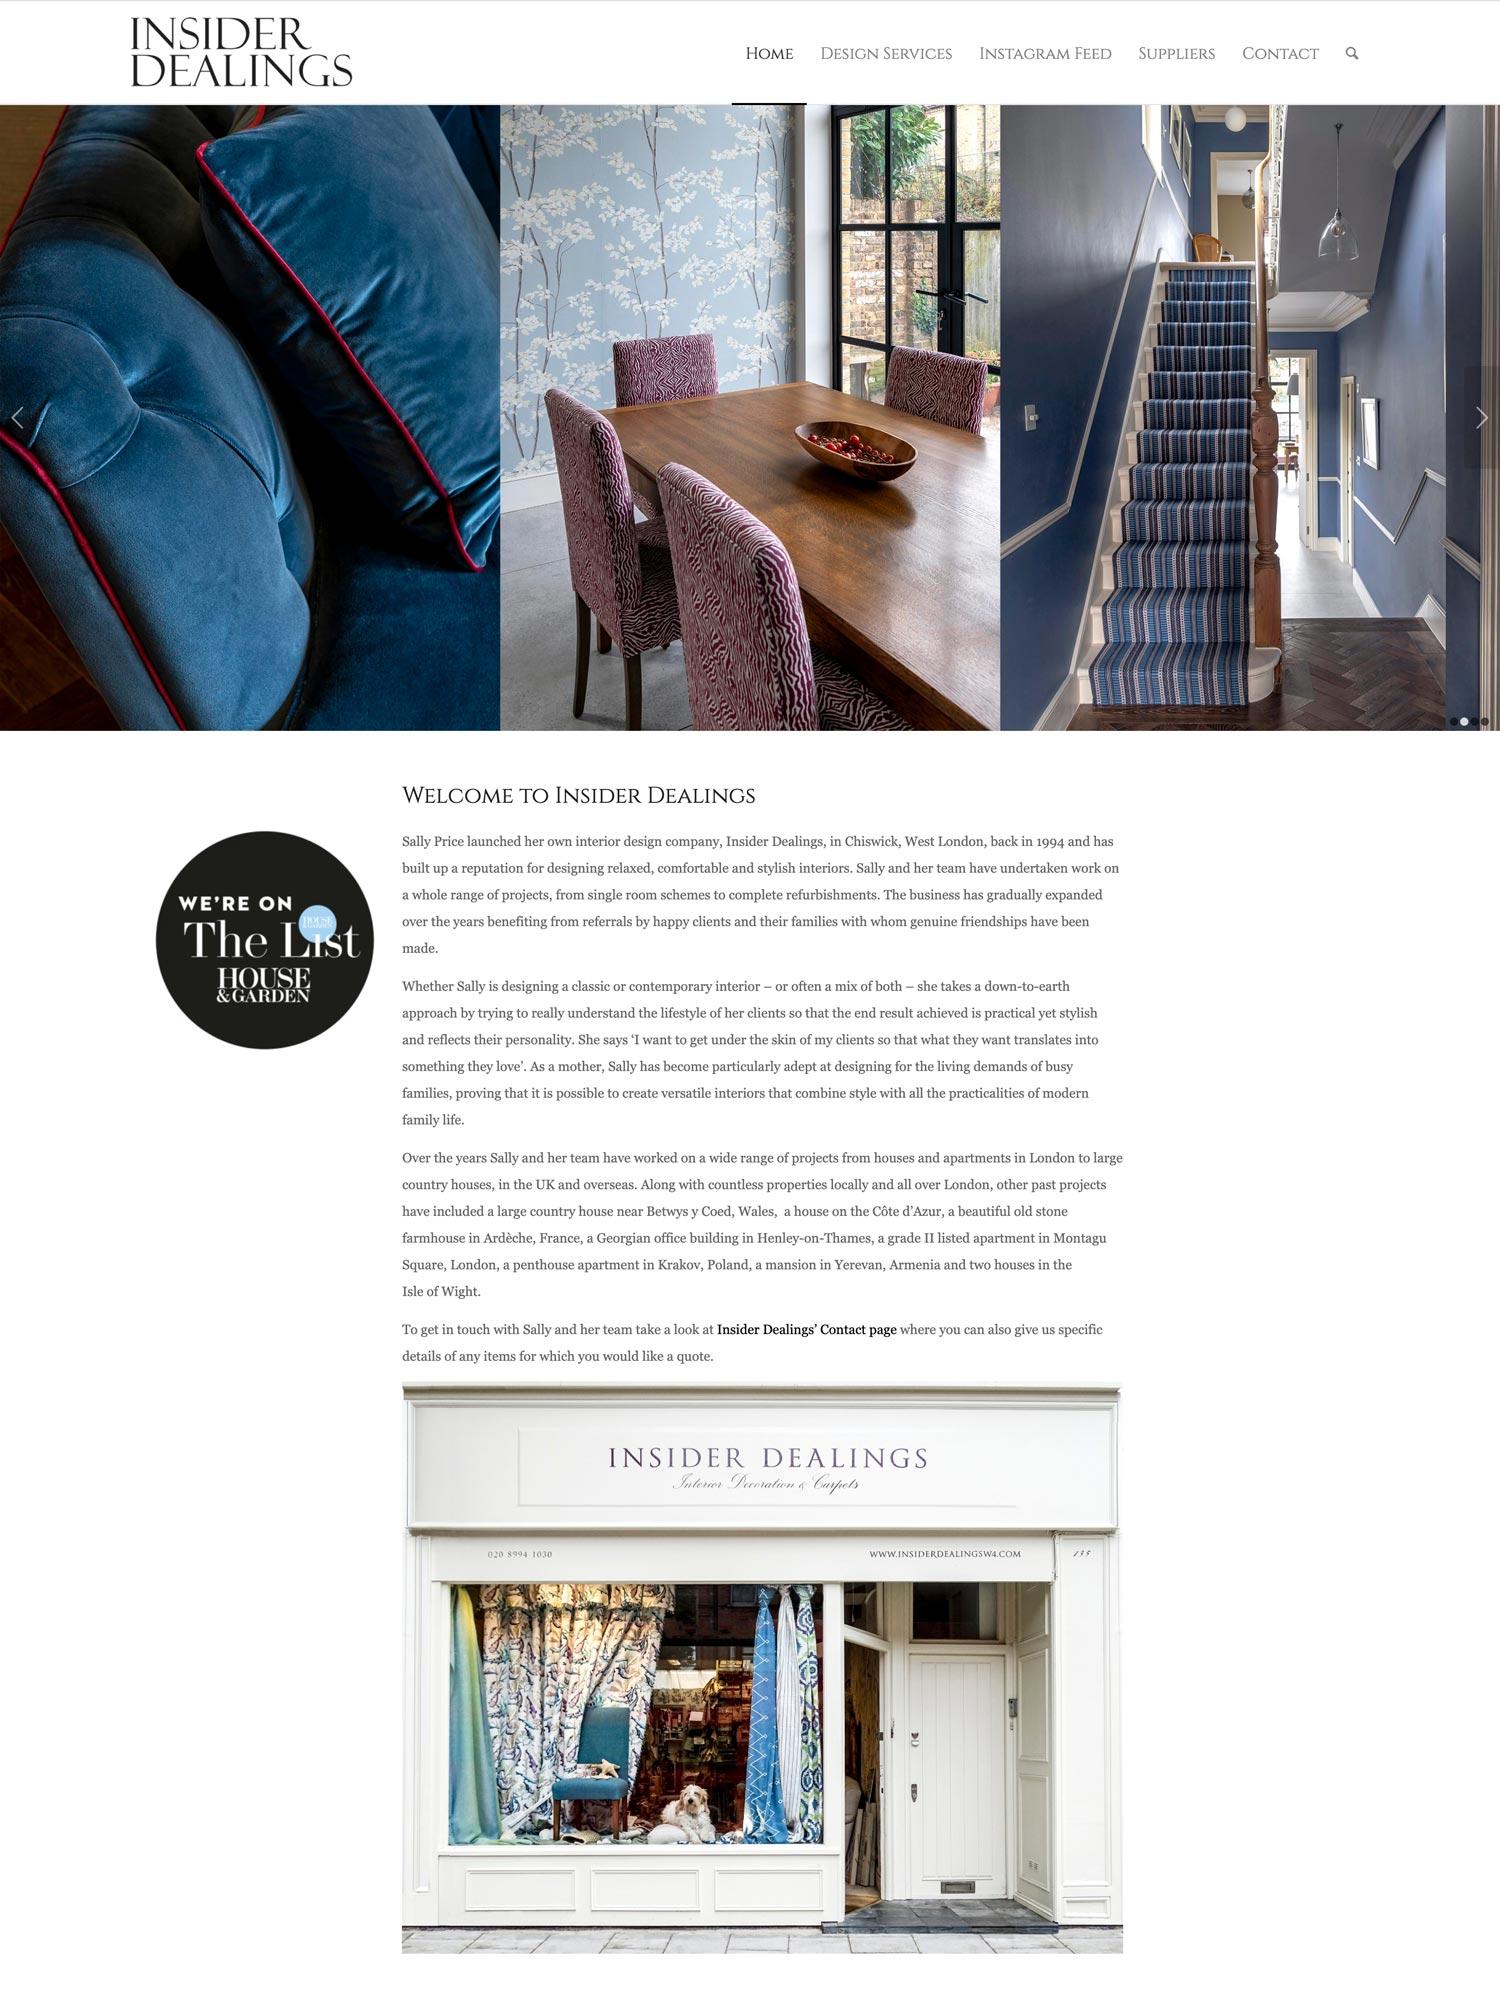 Insider Dealings Website Home 1